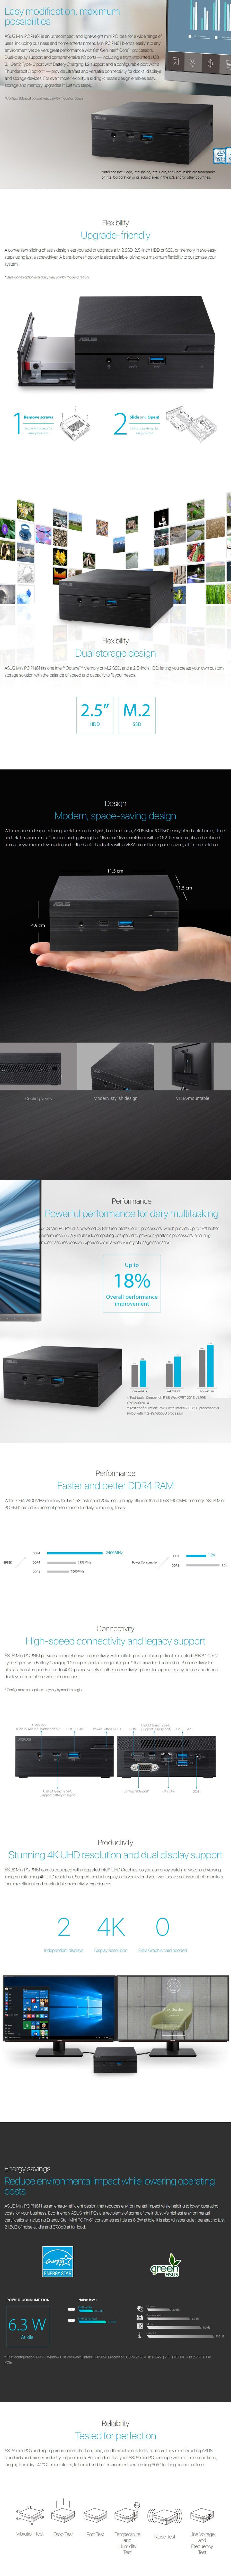 ASUS Mini PC PN61 Barebone Kit - Intel 8th Gen i7-8565U - Desktop Overview 1